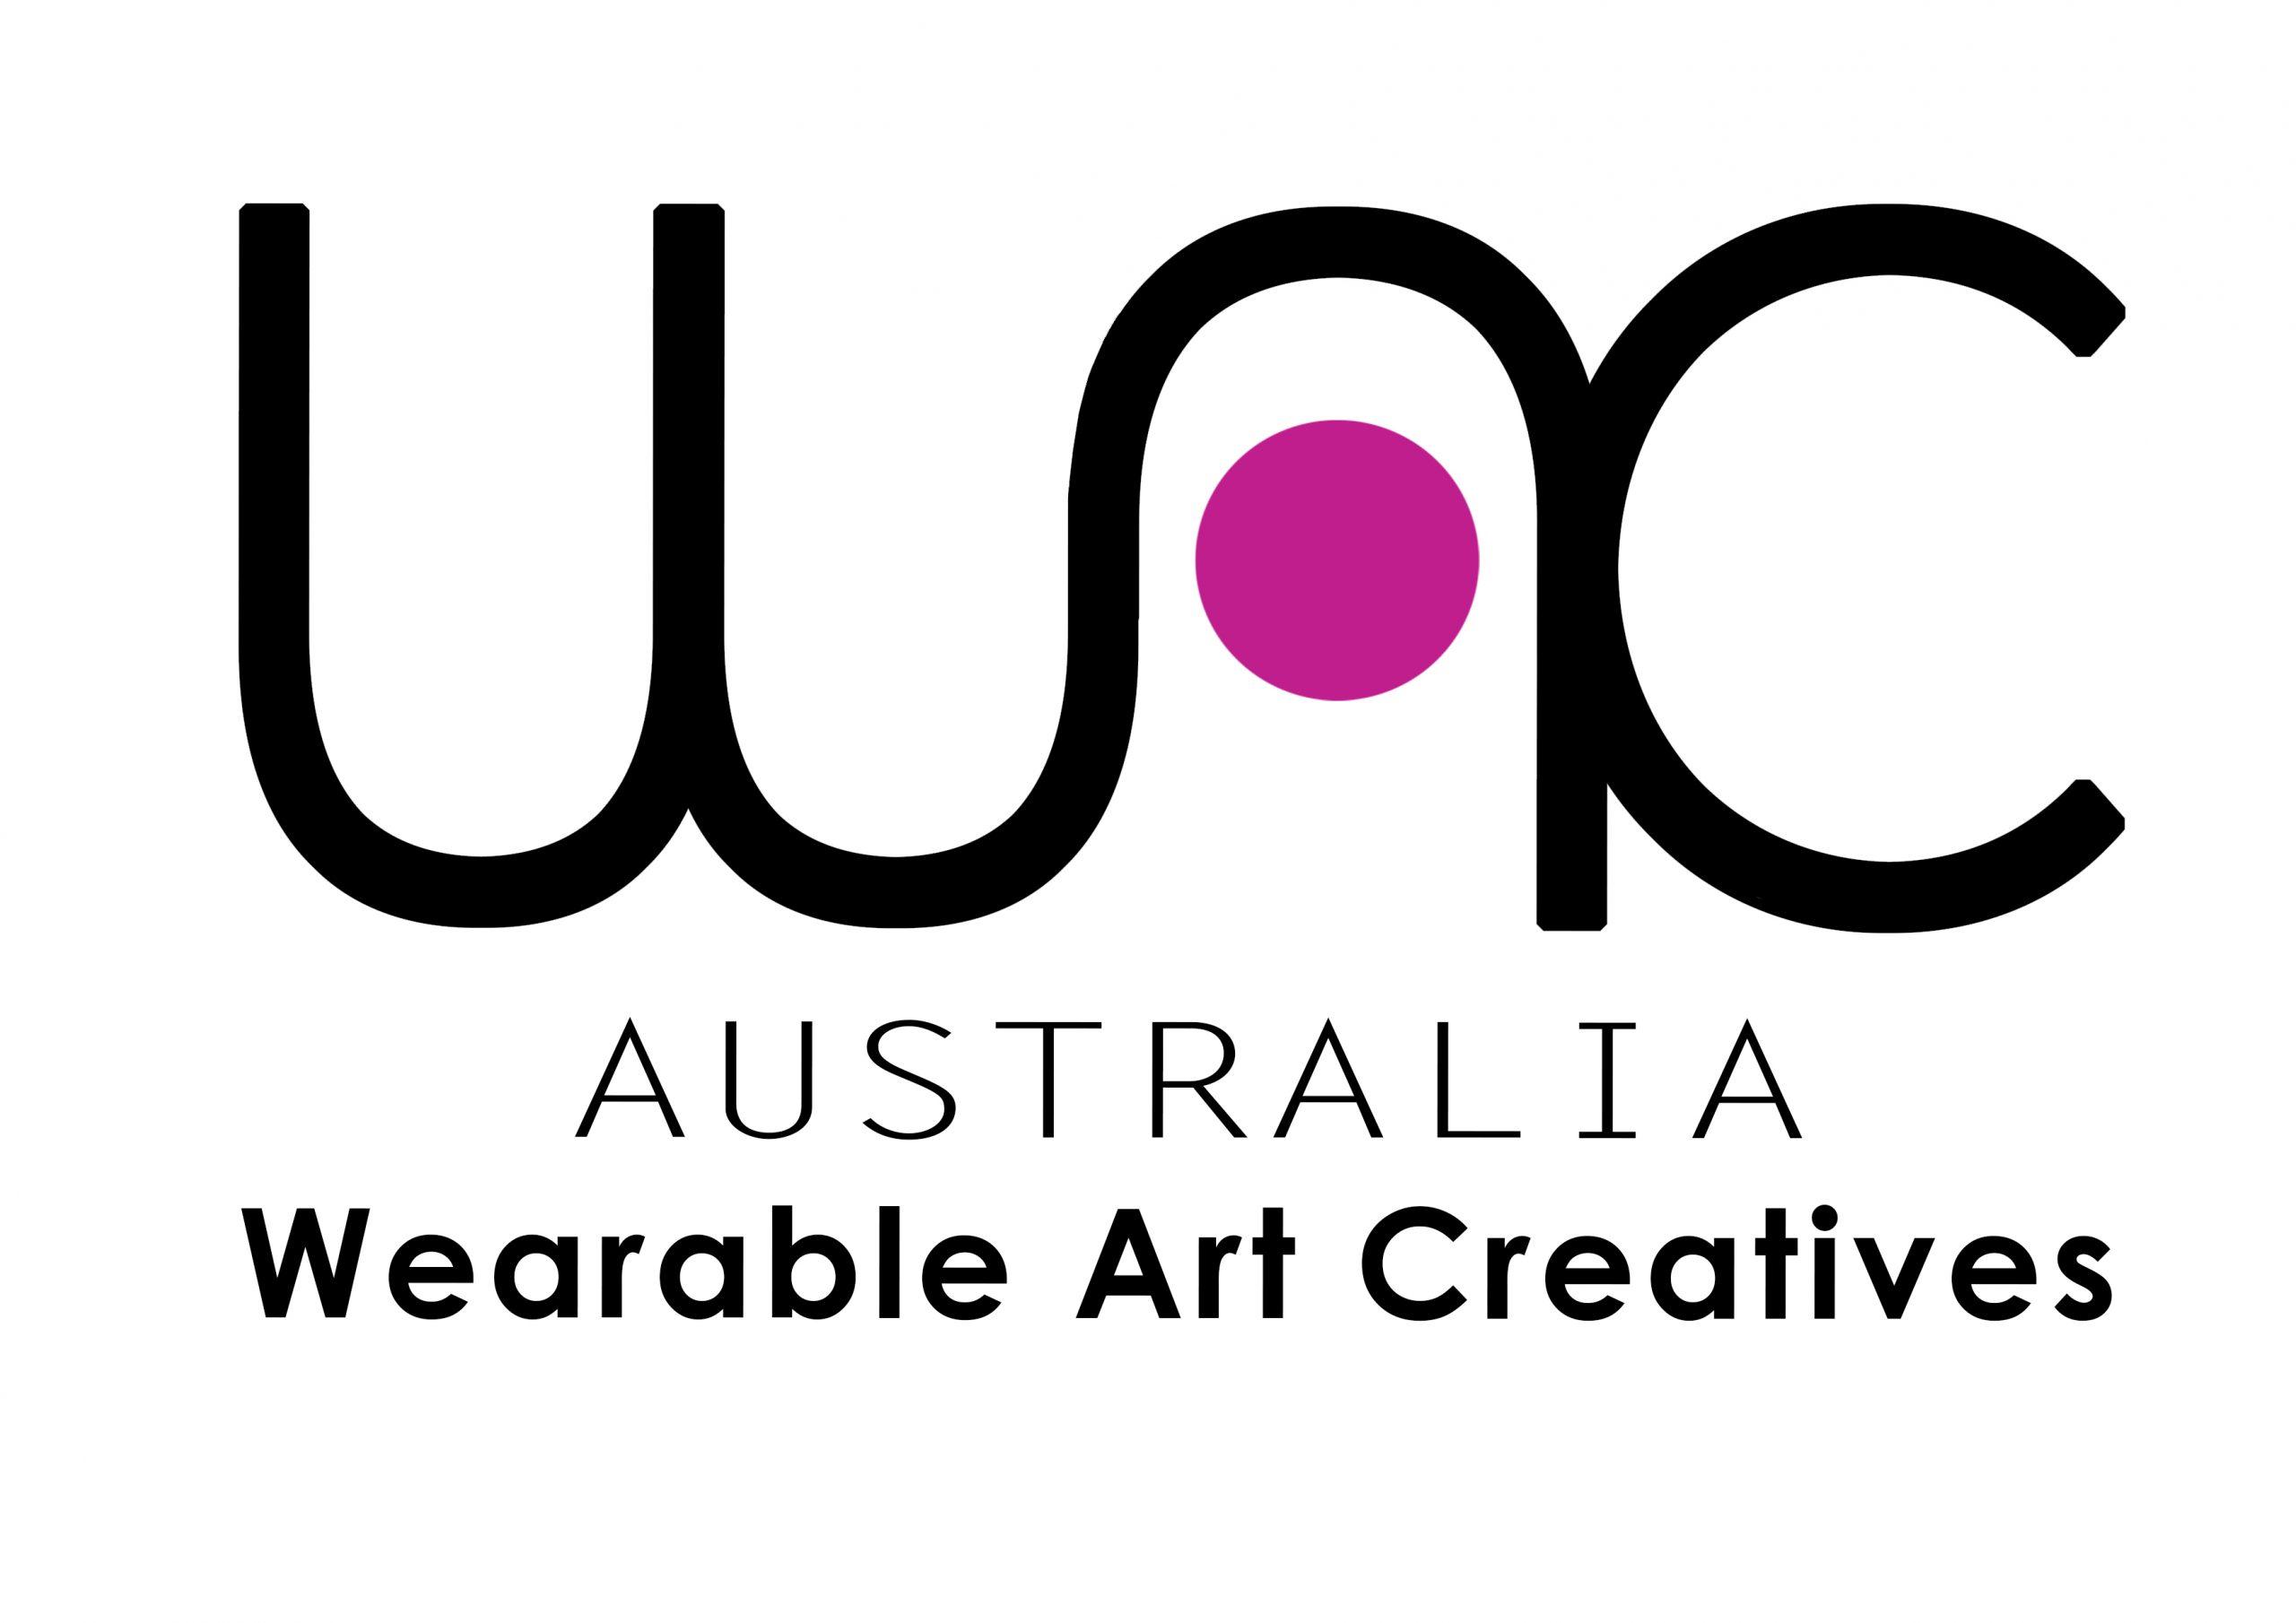 Wearable Art Creatives